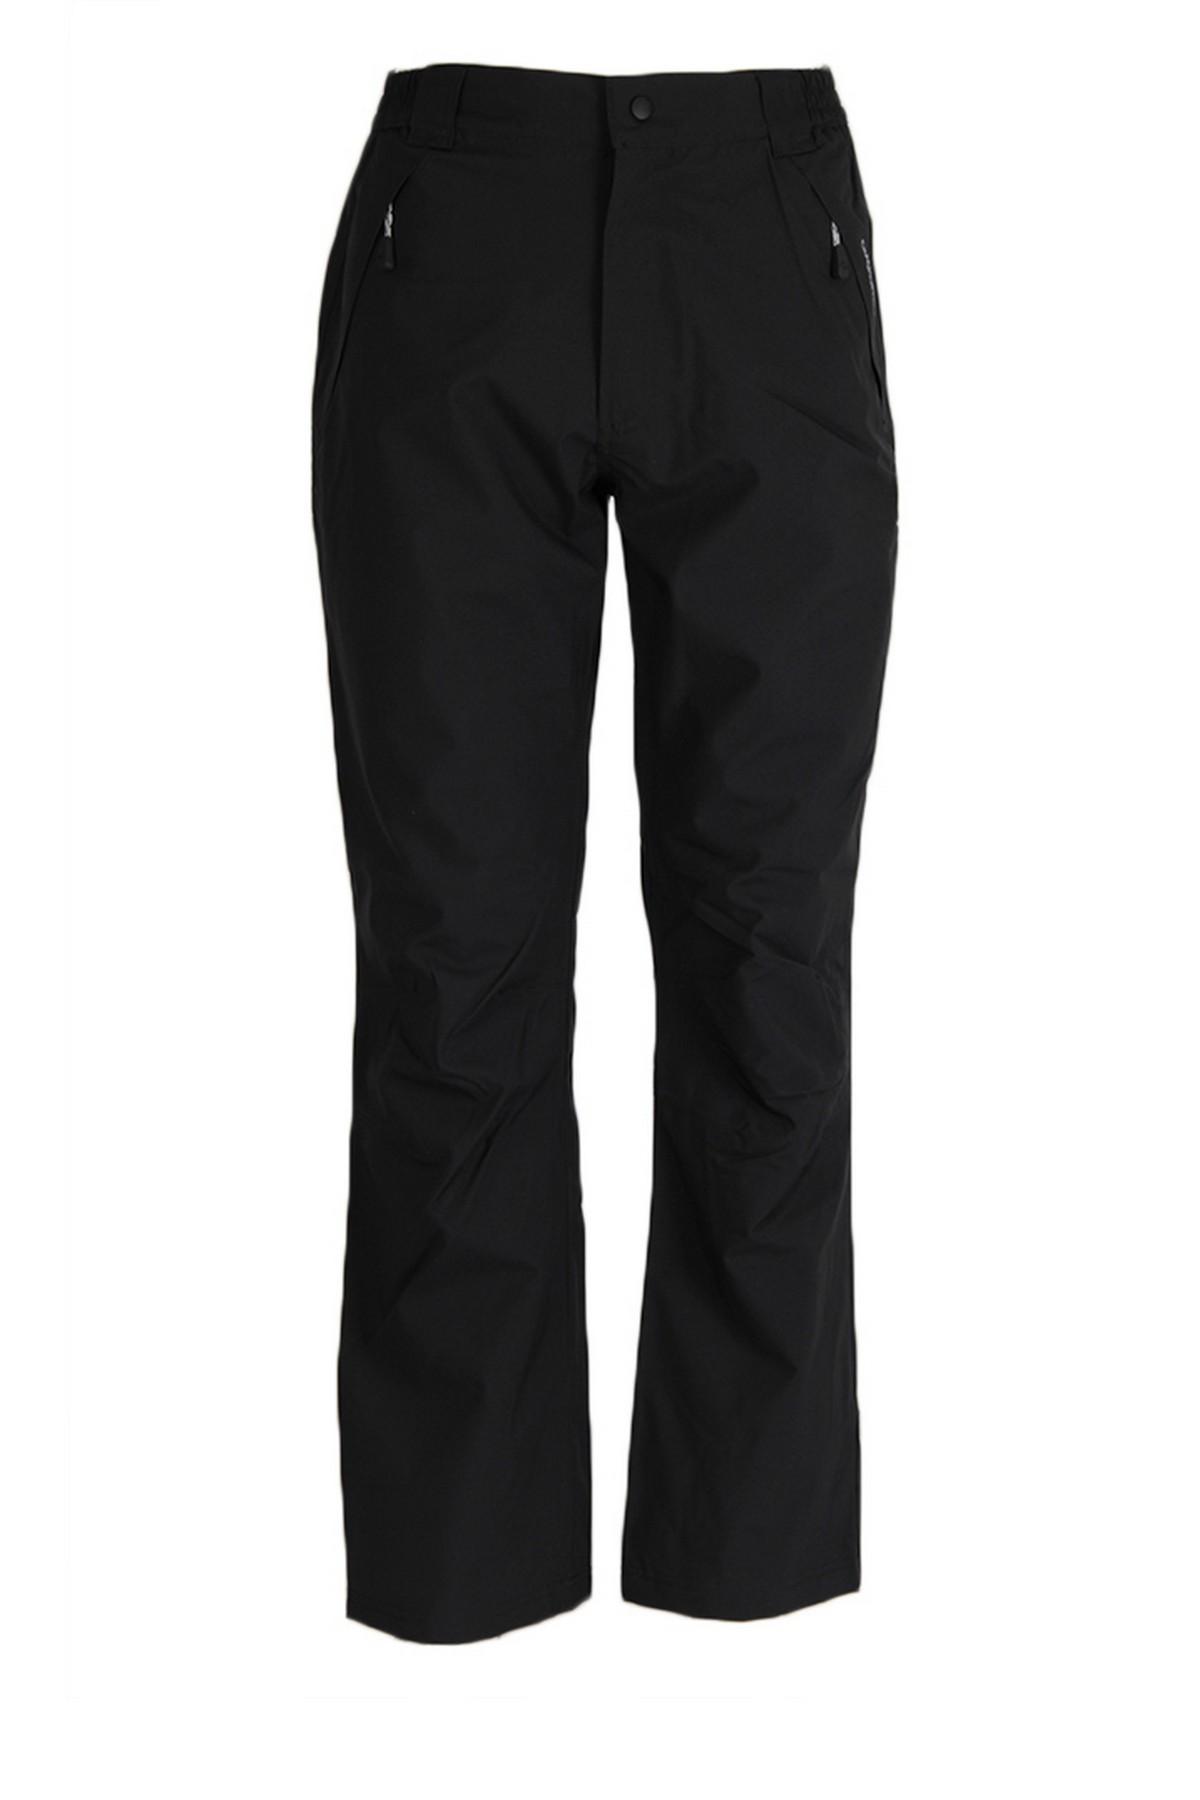 Craghoppers Steall STR Siyah Erkek Pantolon (CMW633R-800)